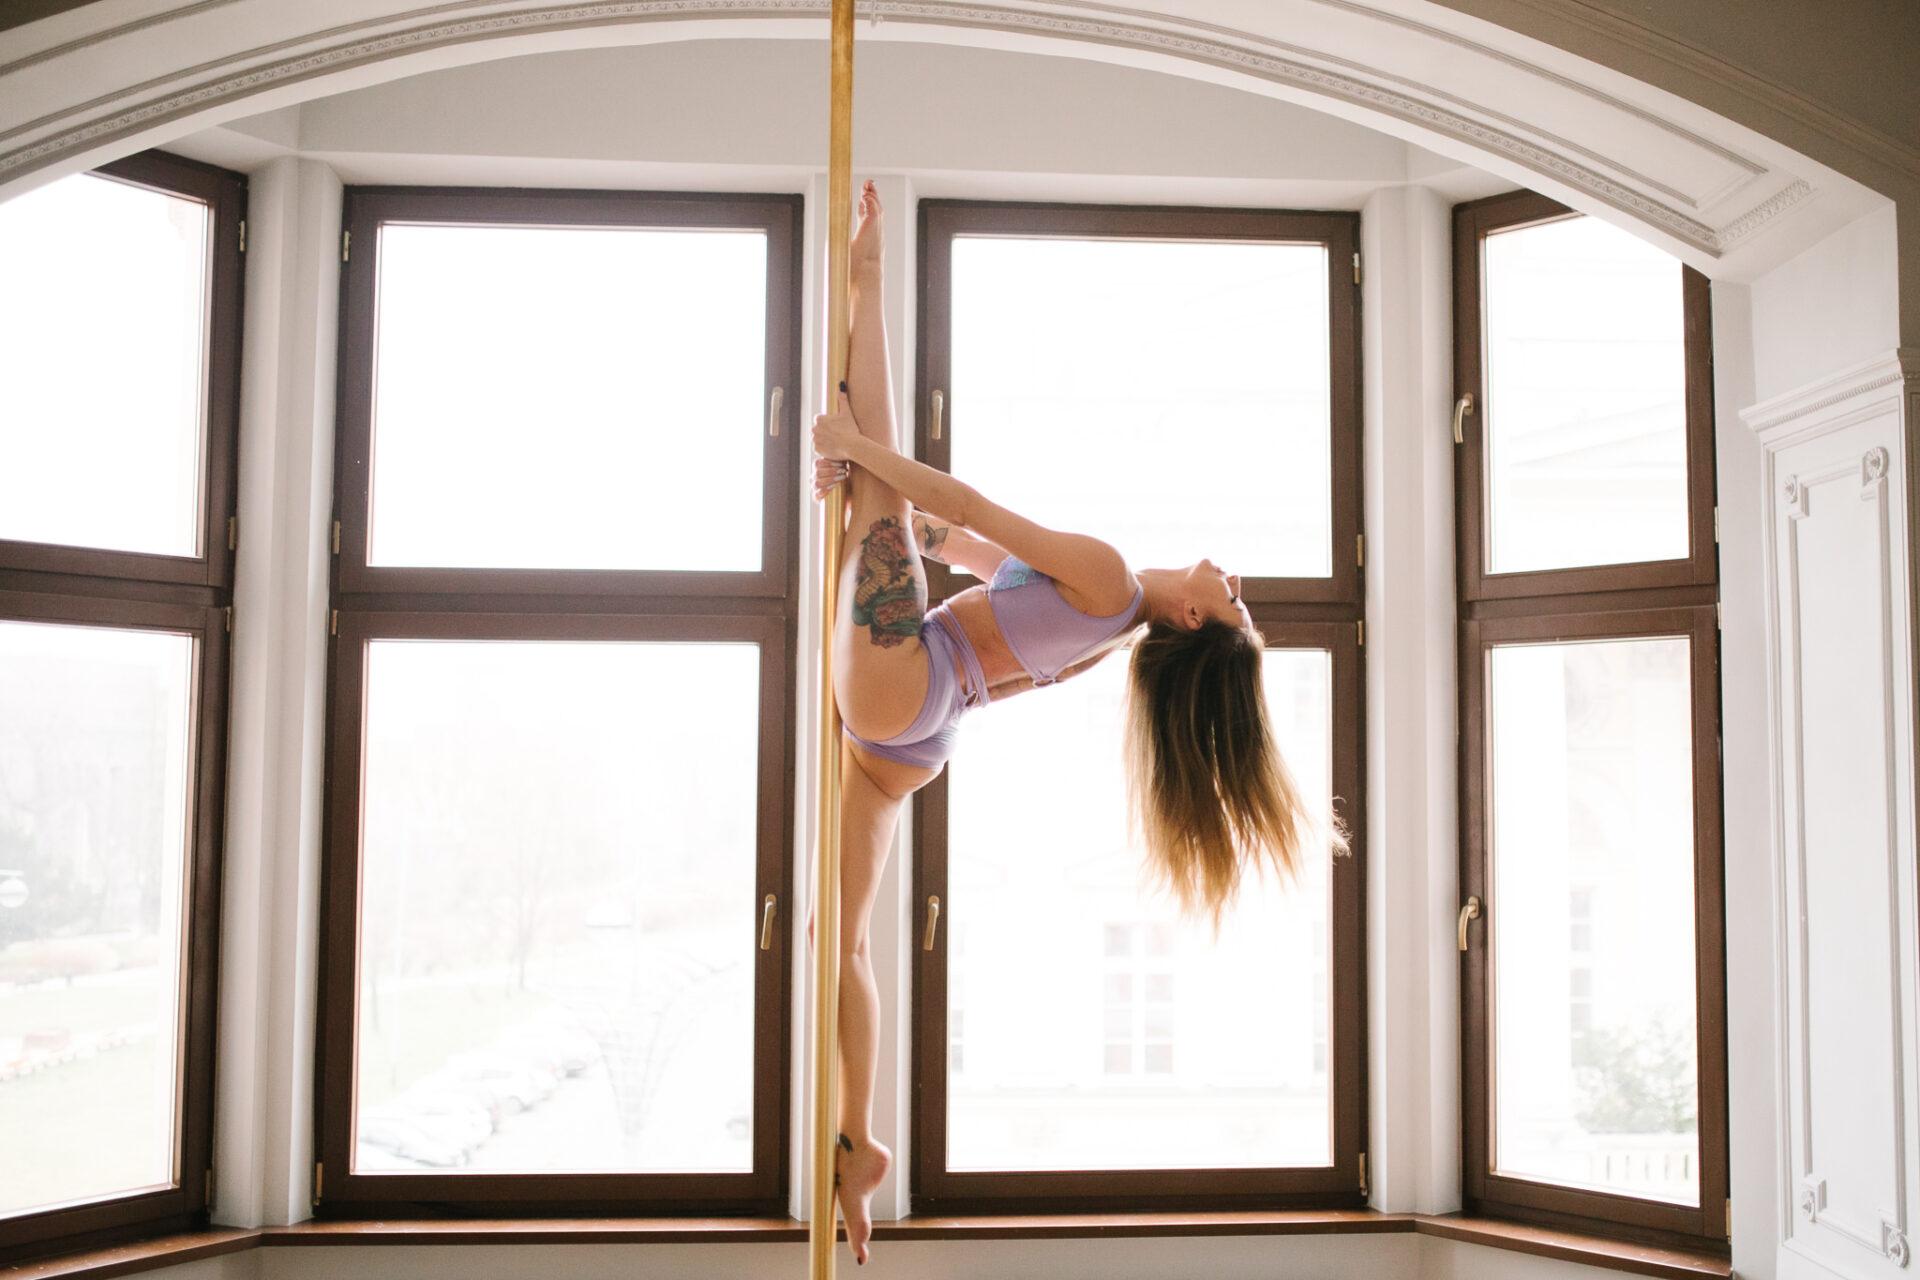 szpagat-pole-dance-figury-na-sesje-pole-dance-pole-empire